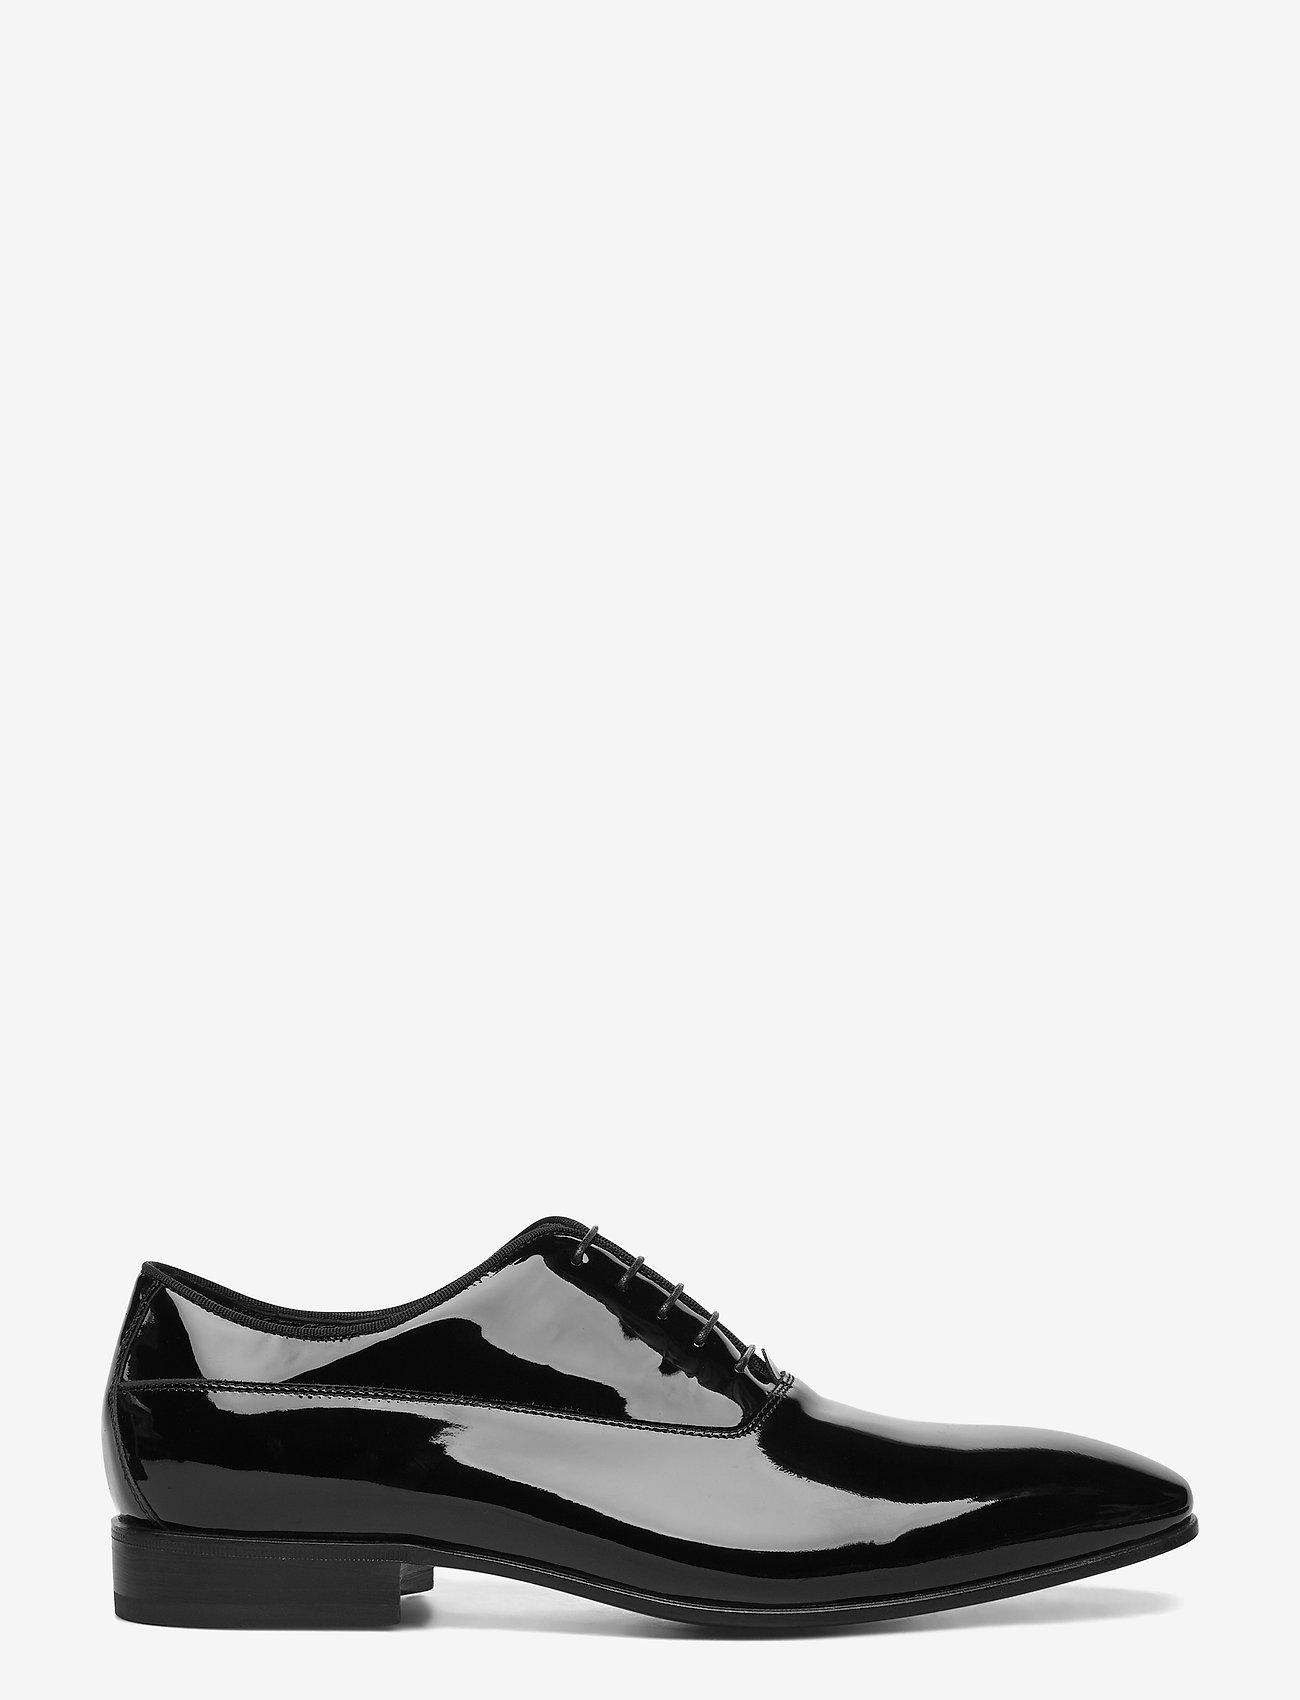 SAND - Footwear MW - F834 - nauhakengät - black - 1